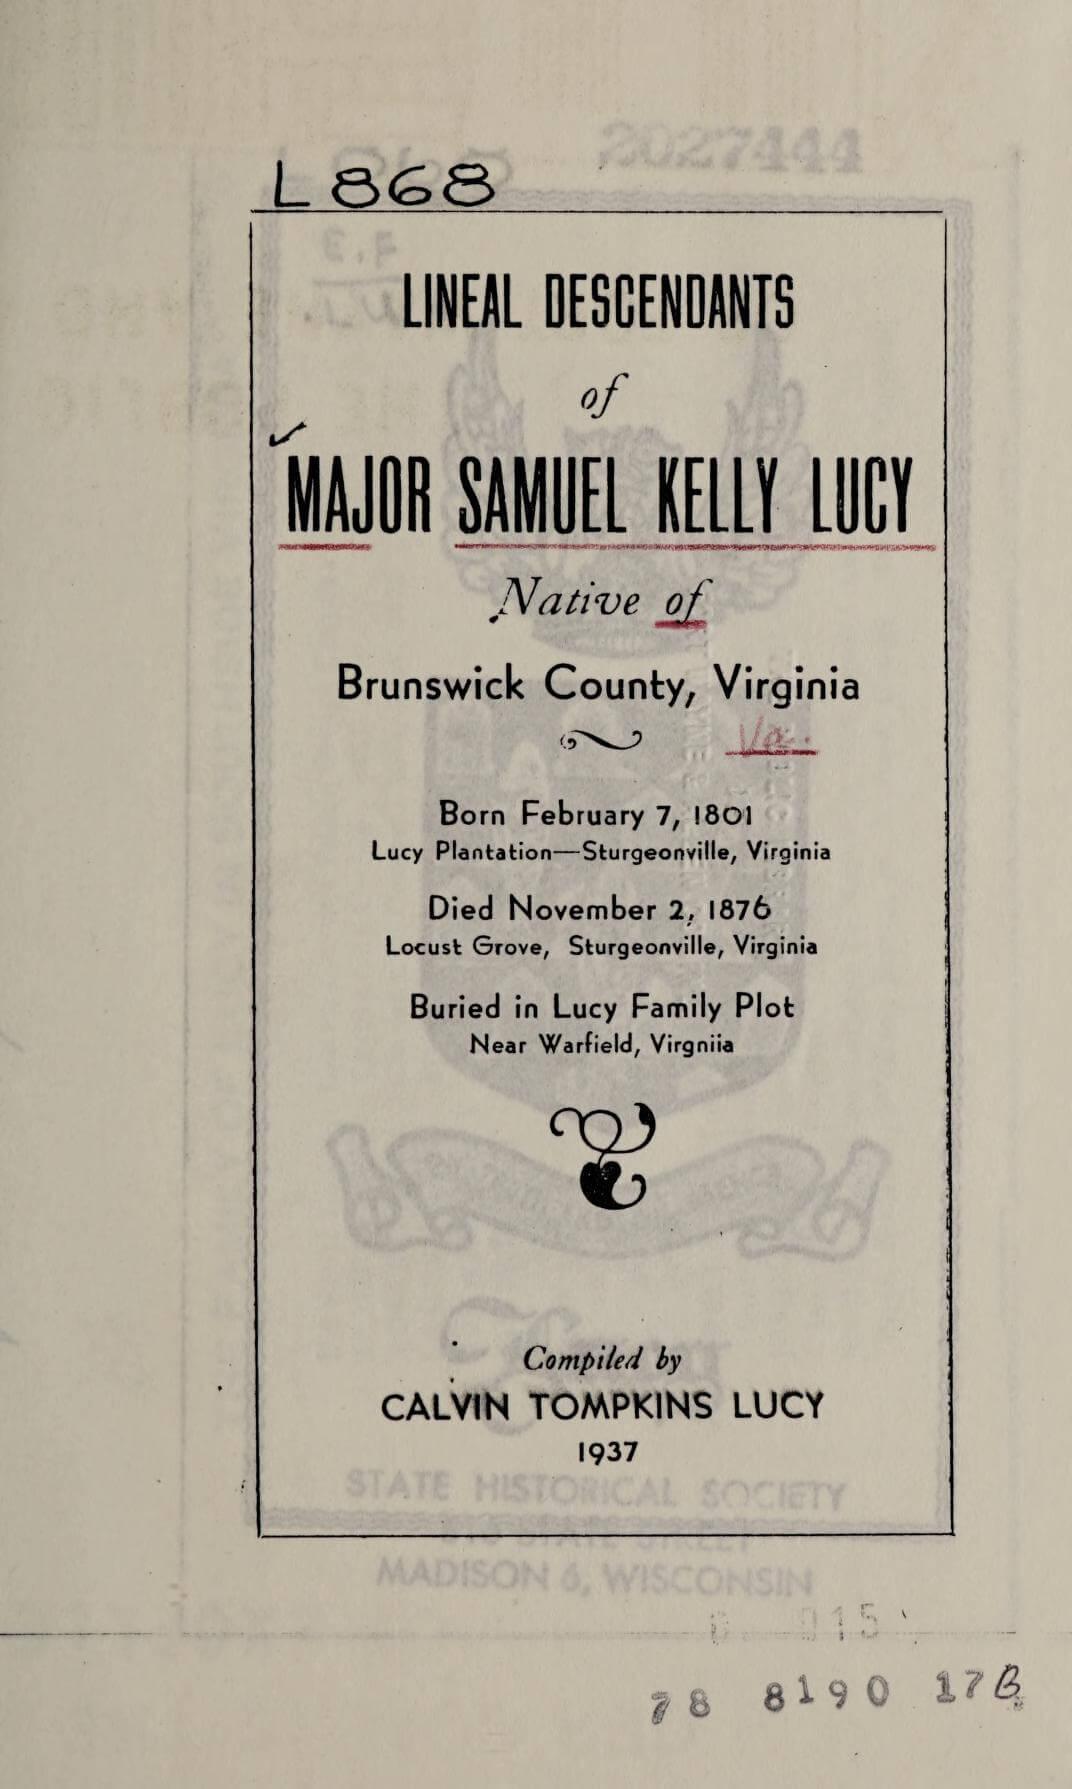 Lineal descendants of Major Samuel Kelly Lucy